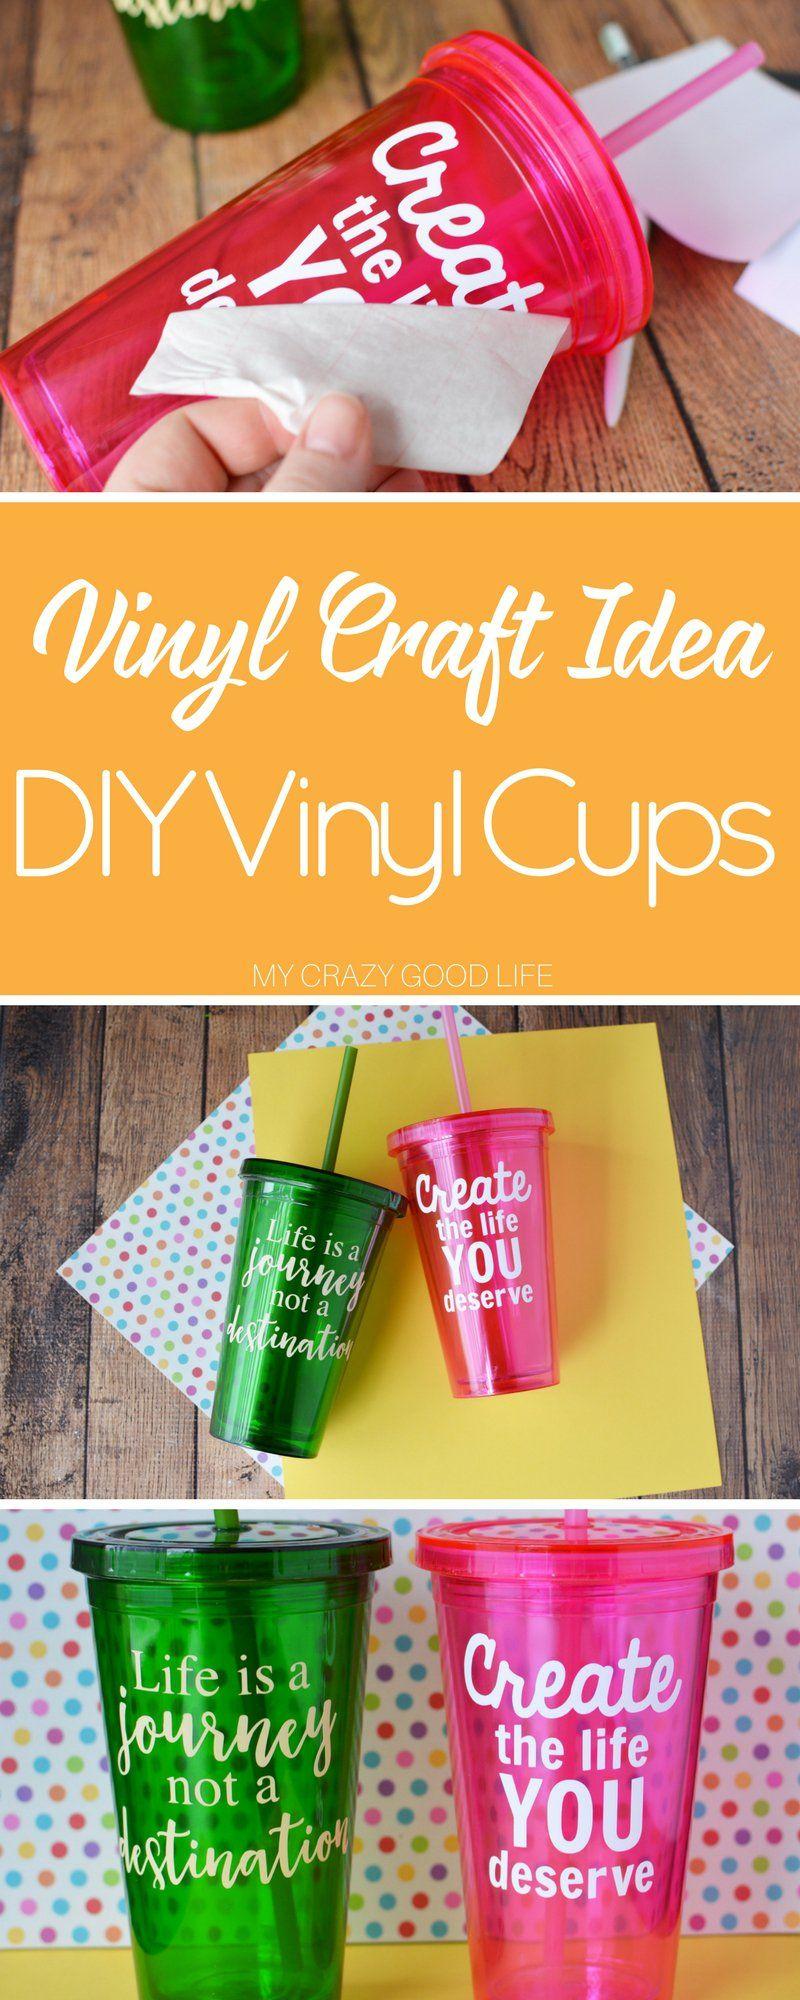 Vinyl Craft Idea Diy vinyl cups, Diy crafts to sell